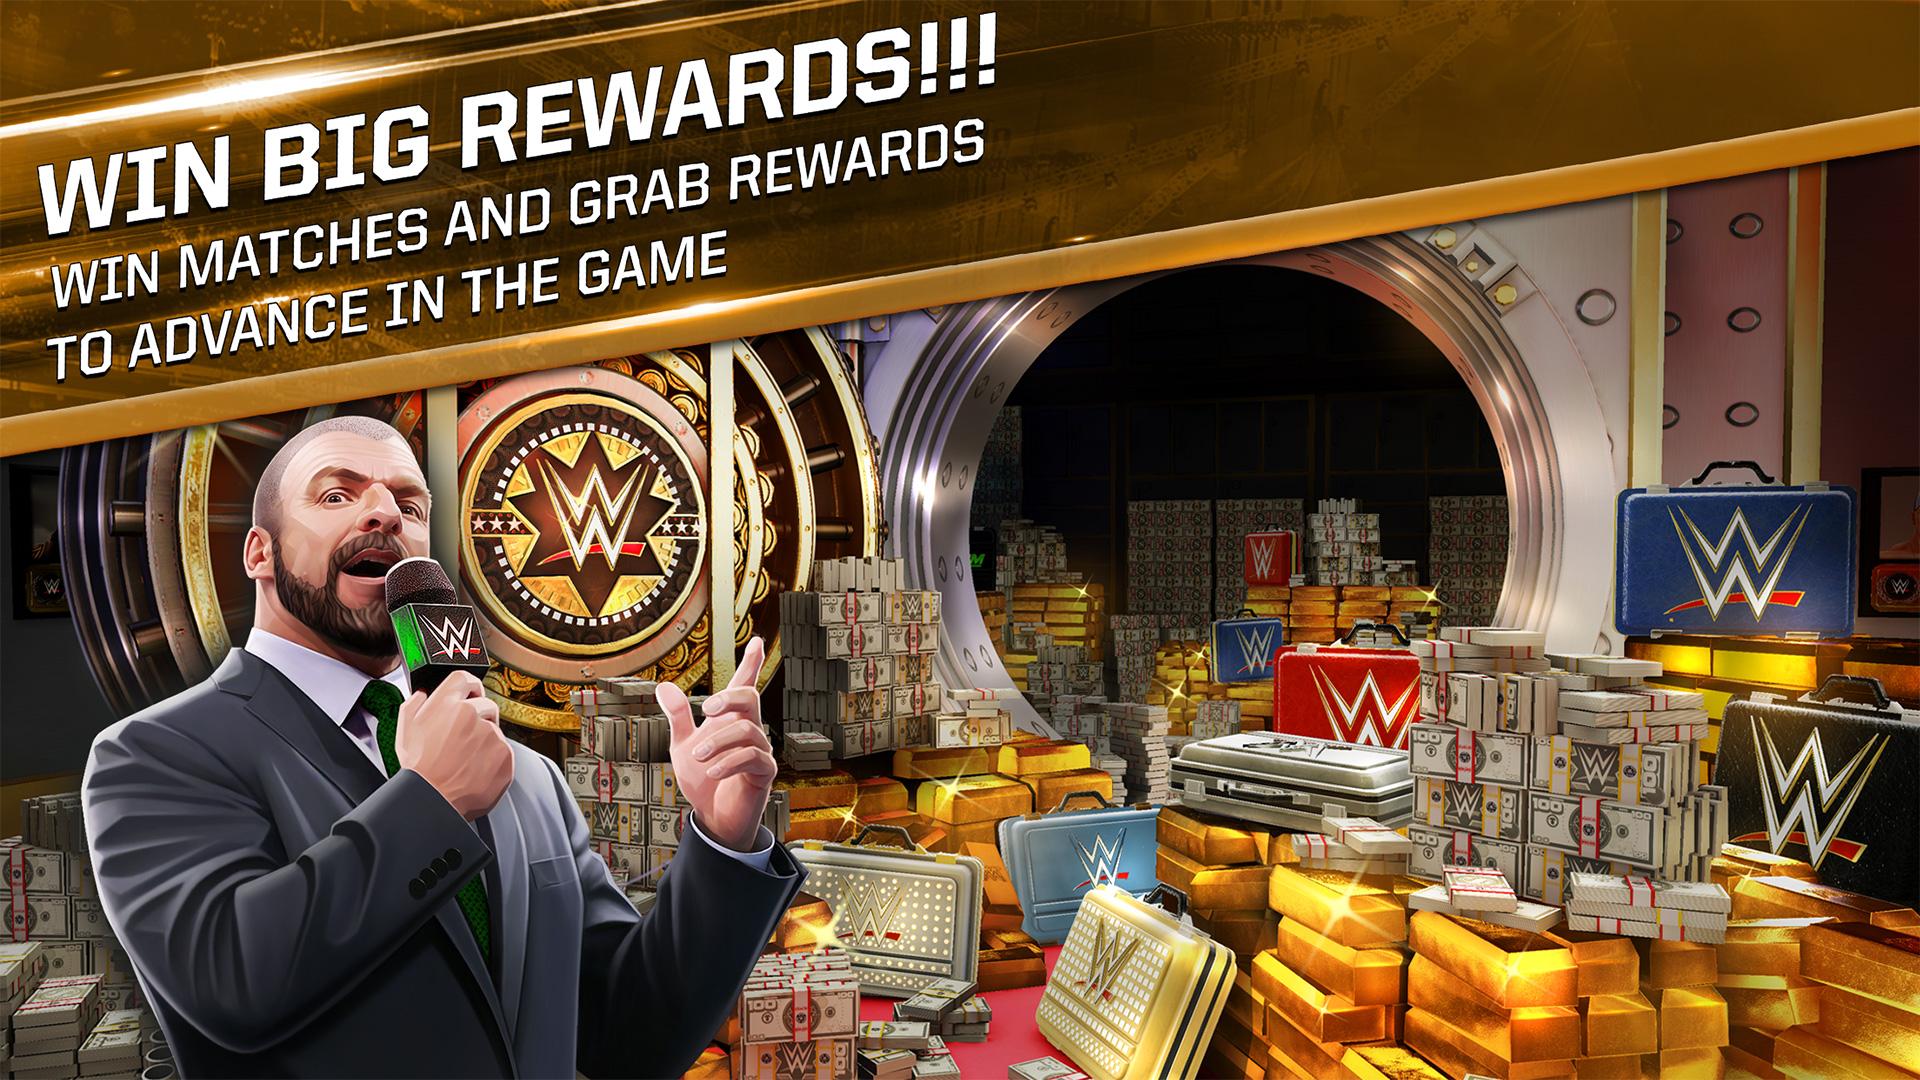 Screenshot 07 - Win Rewards.jpeg